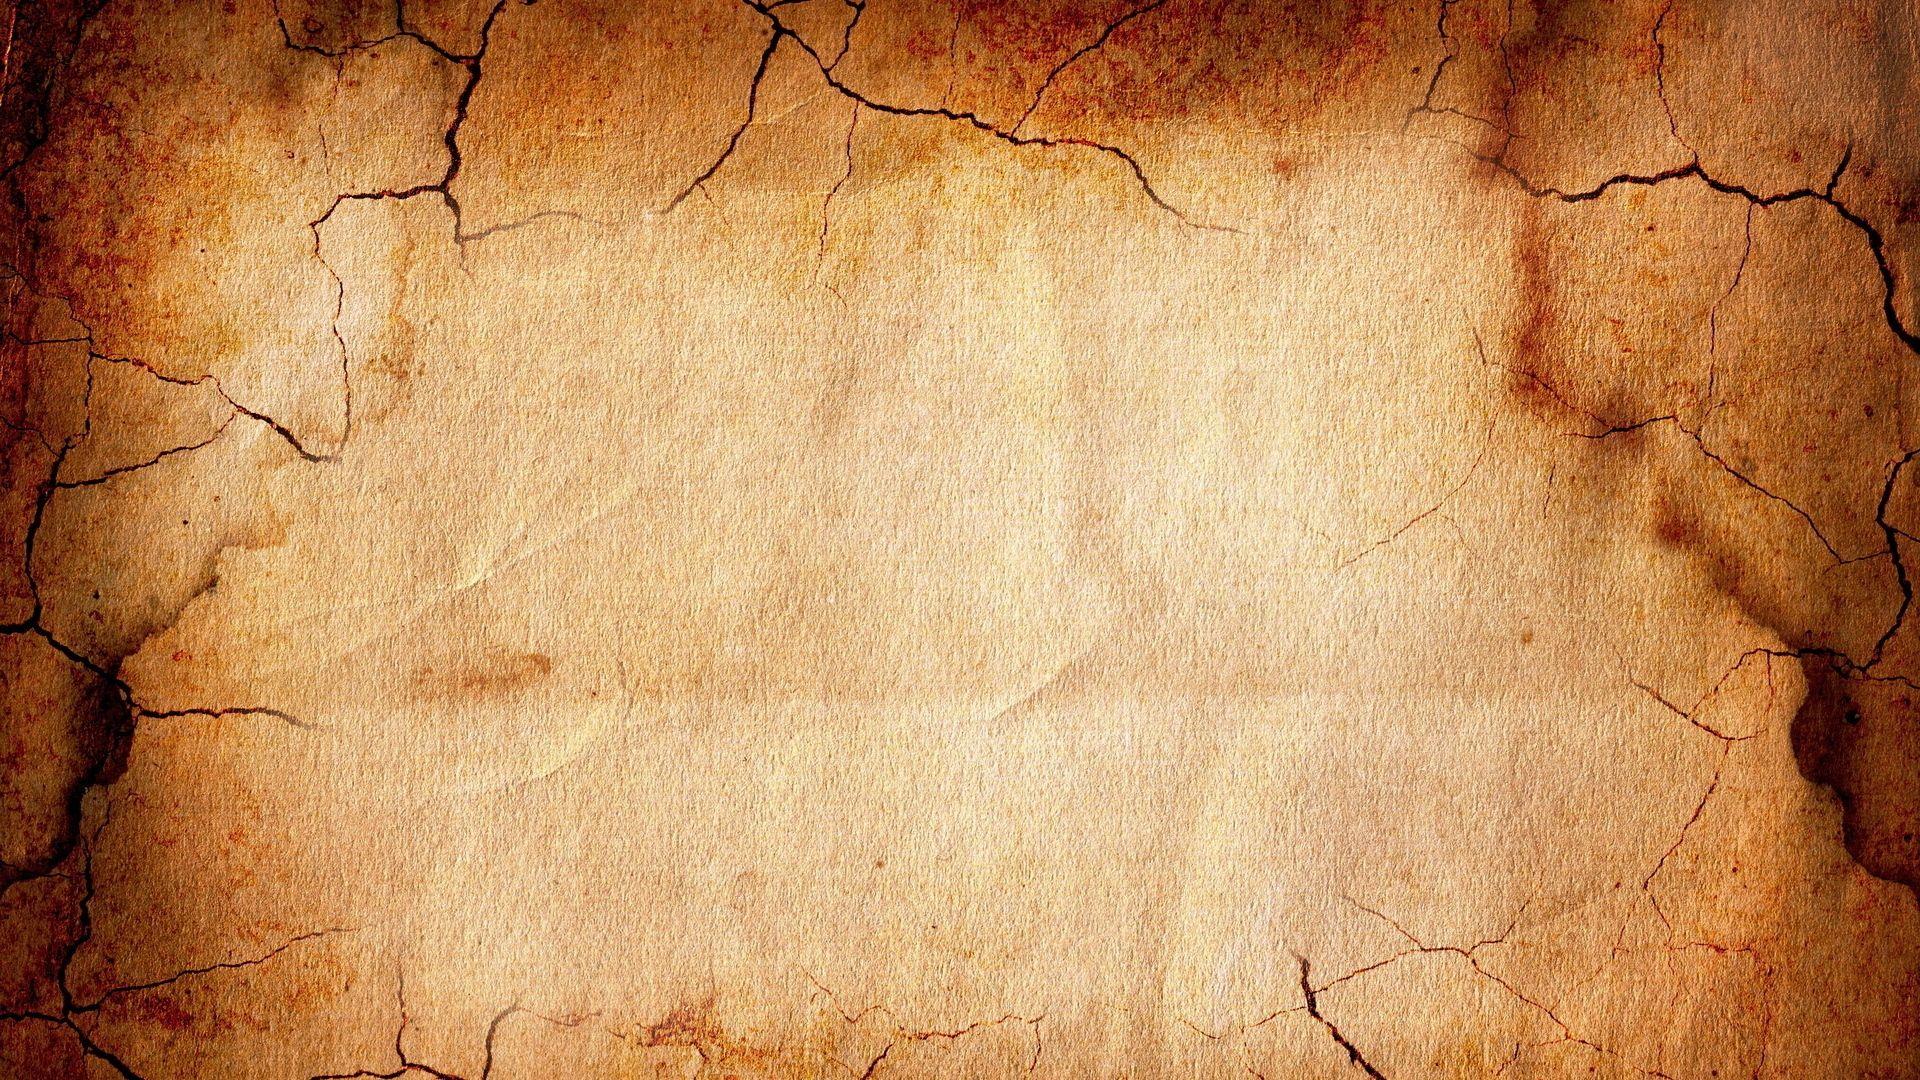 Download Wallpaper 1920x1080 Paper Background Cracks Wall Lights Full Hd 1080p Hd Background Old Paper Background Paper Background History Wallpaper